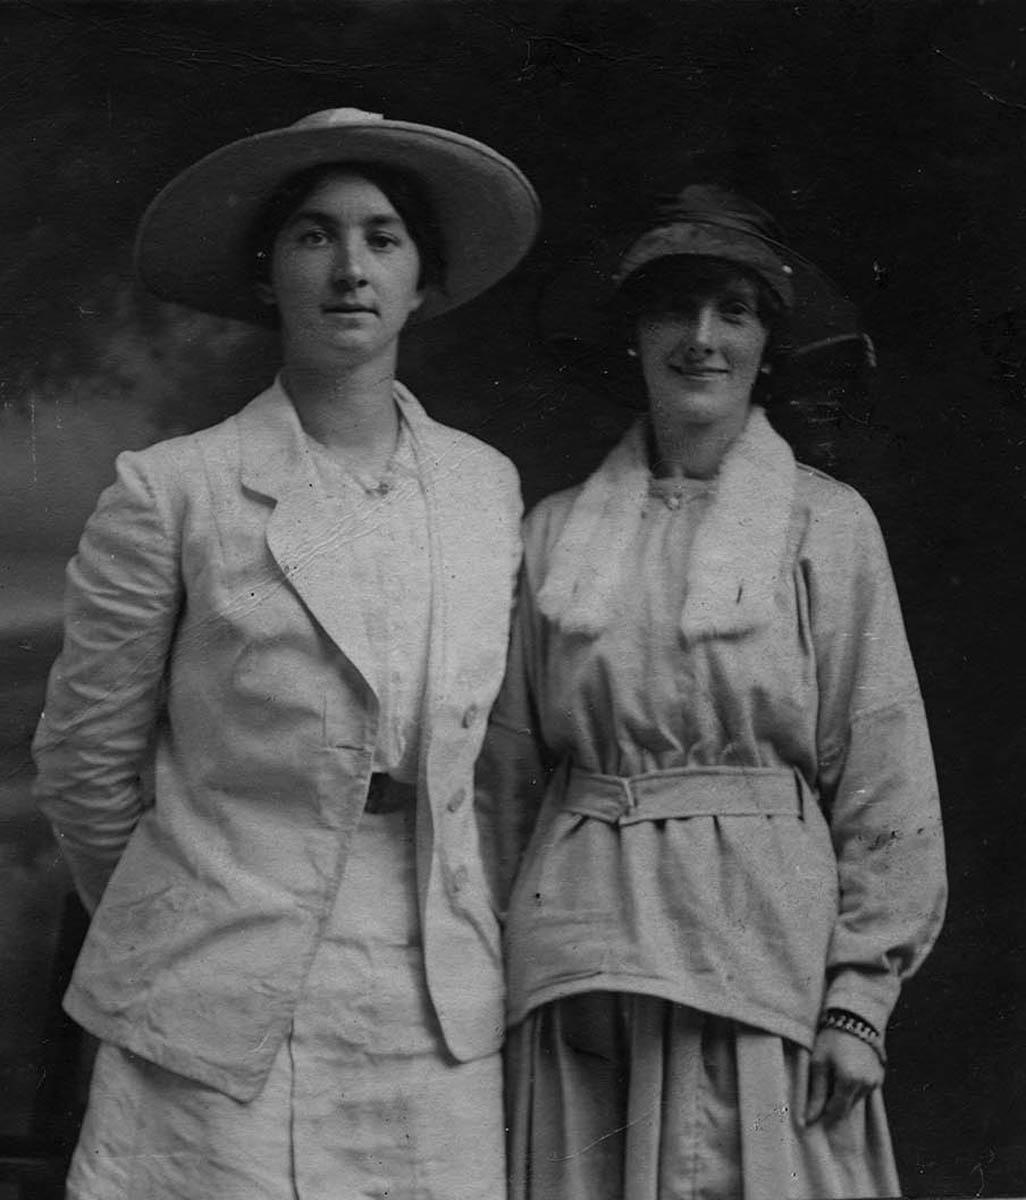 Conlon // County Monaghan :: Two women in a photographer's studio